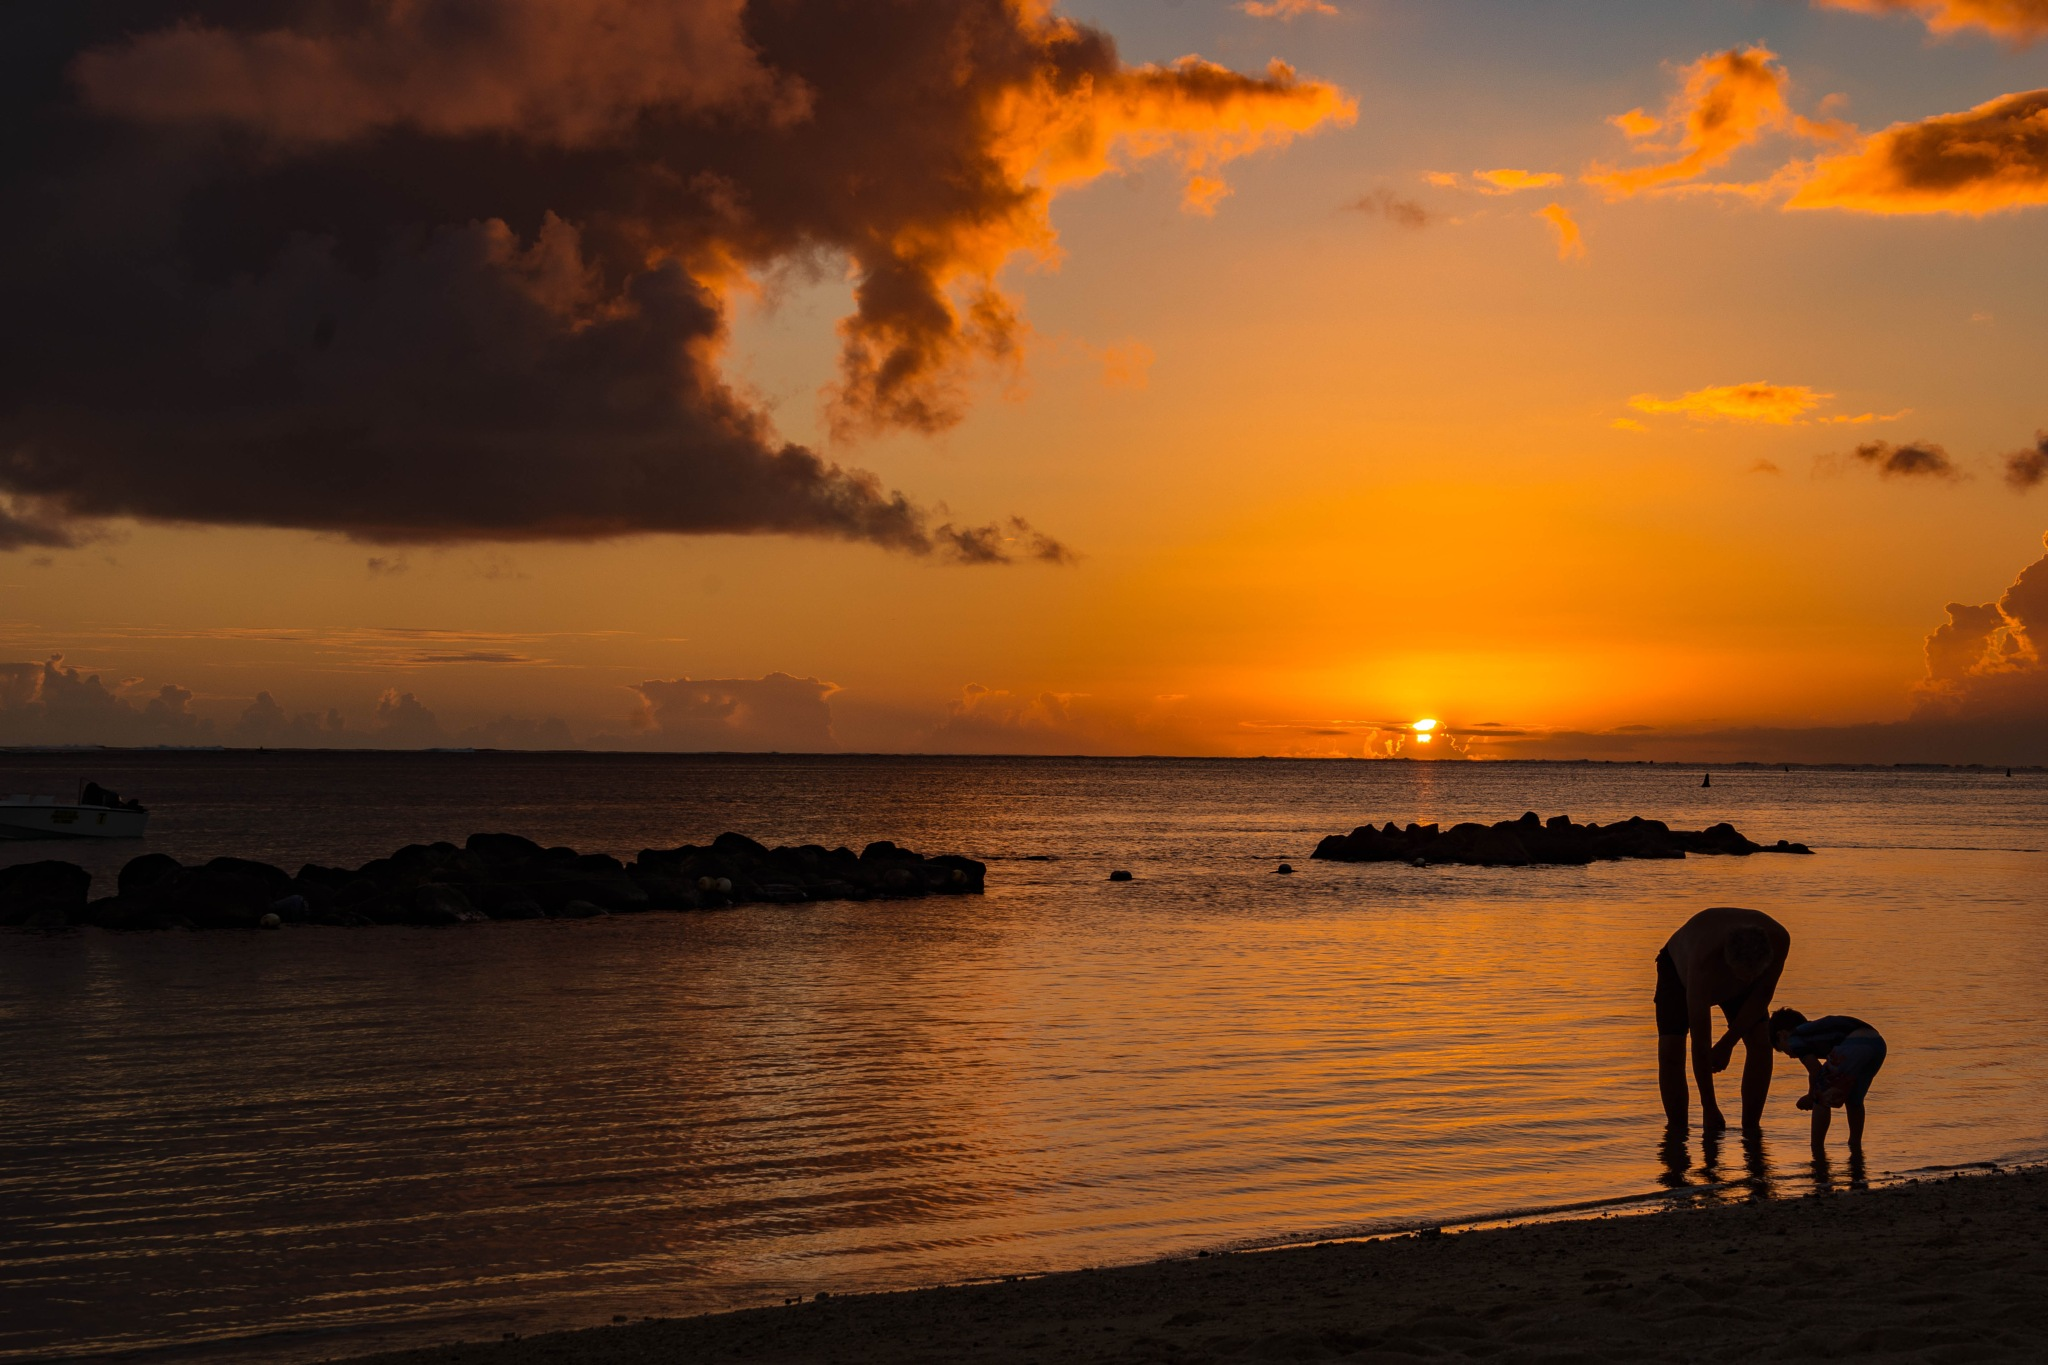 Sunset on beach by Saba Safdar